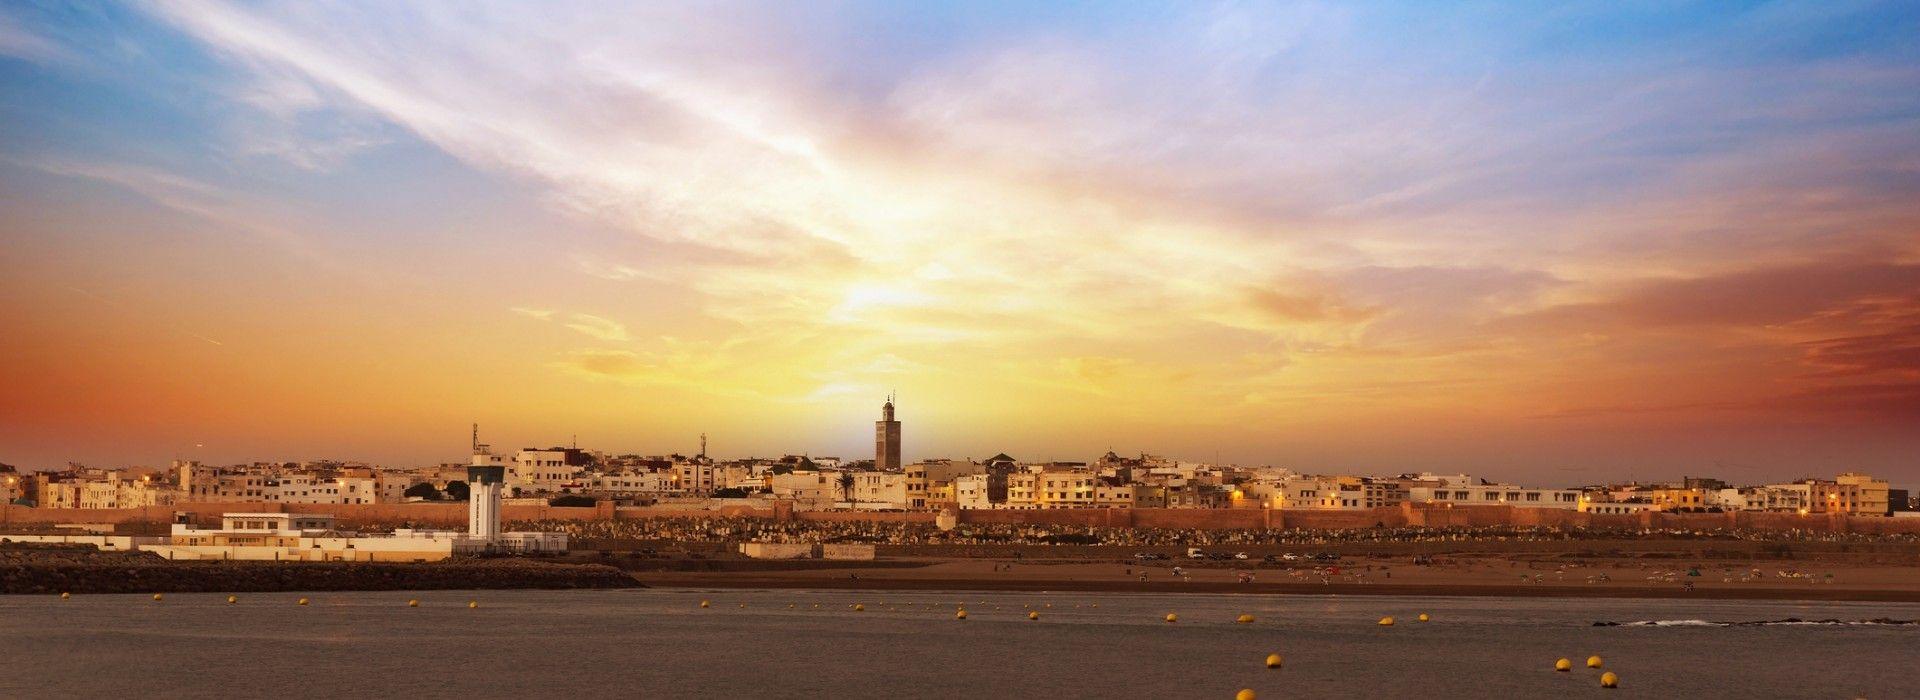 Explorer Tours in Marrakech